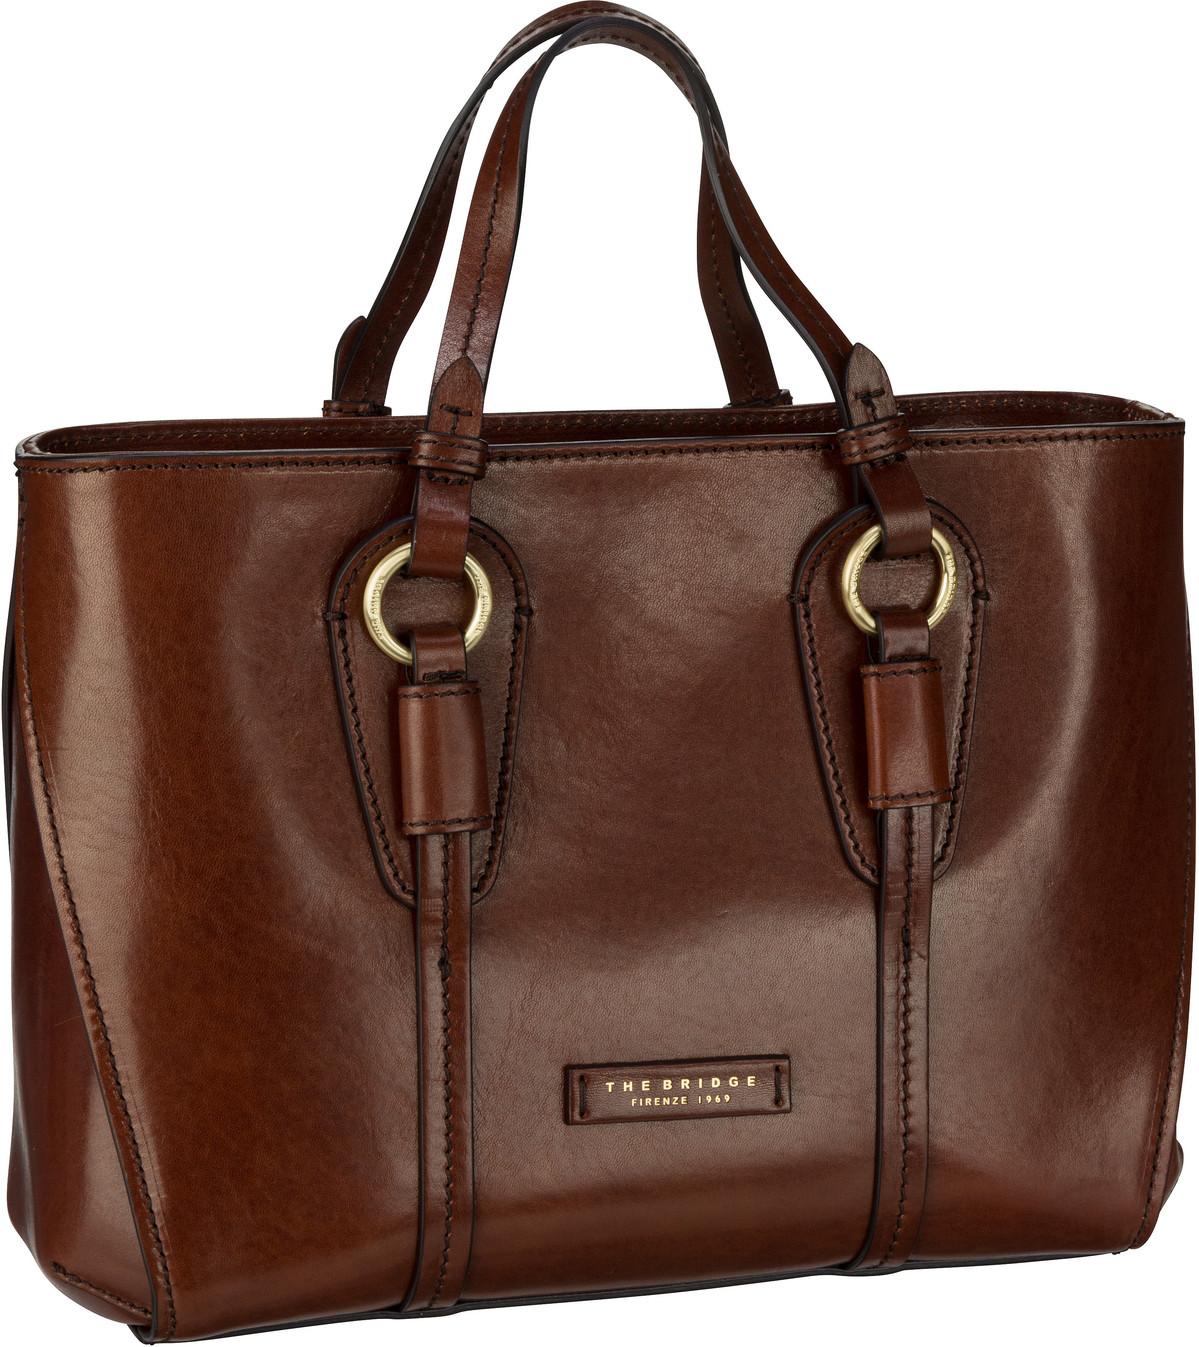 Handtasche Strozzi 3830 Marrone/Oro